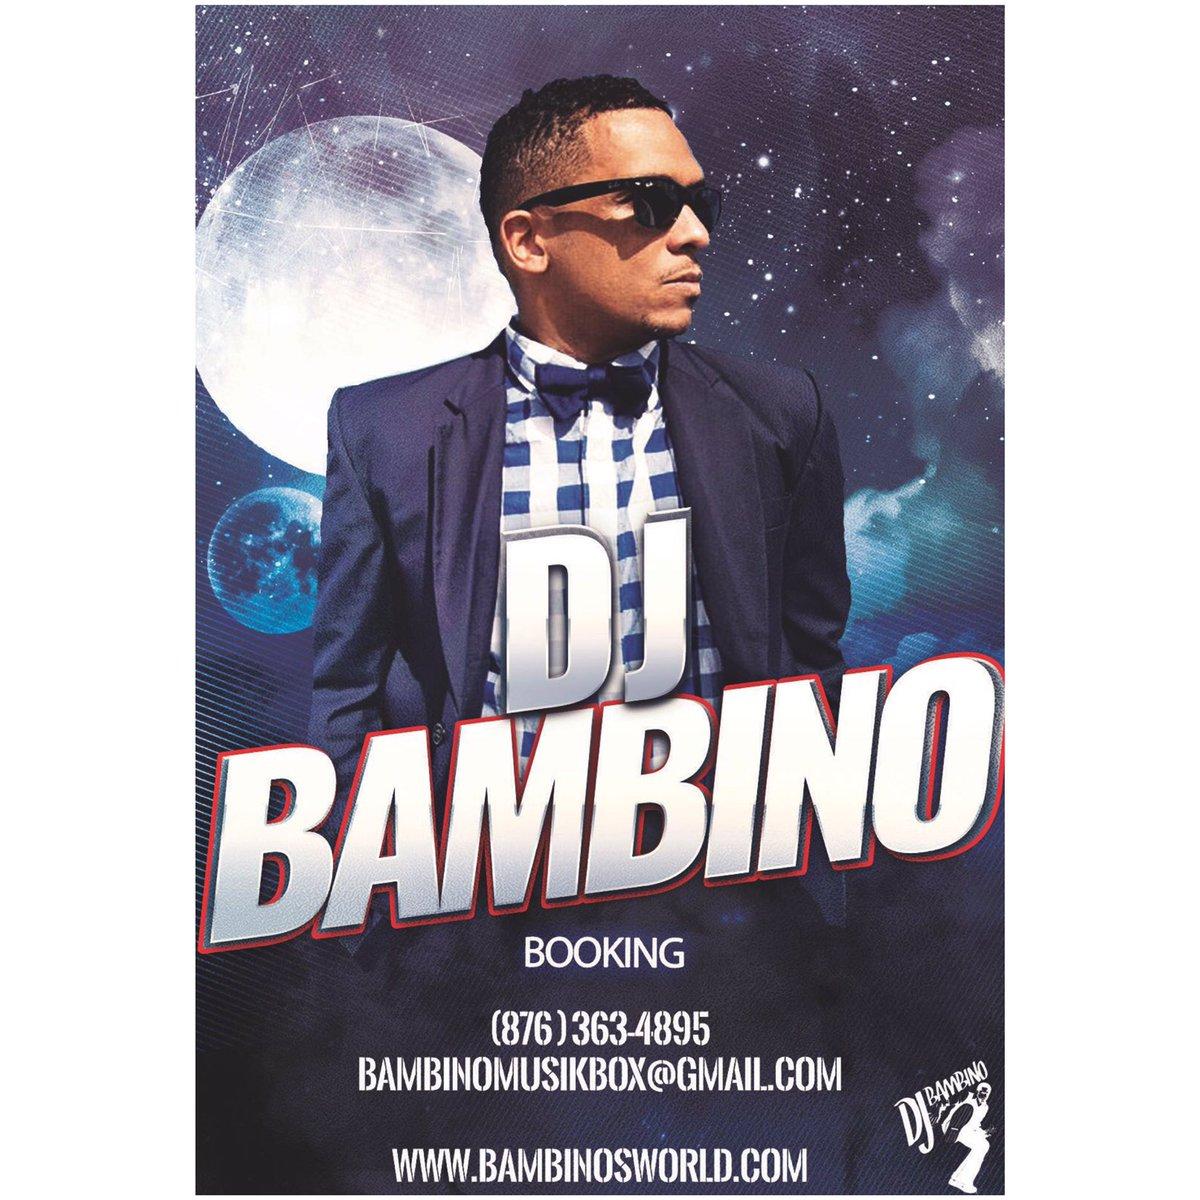 Dj Bambino On Twitter Booking Info